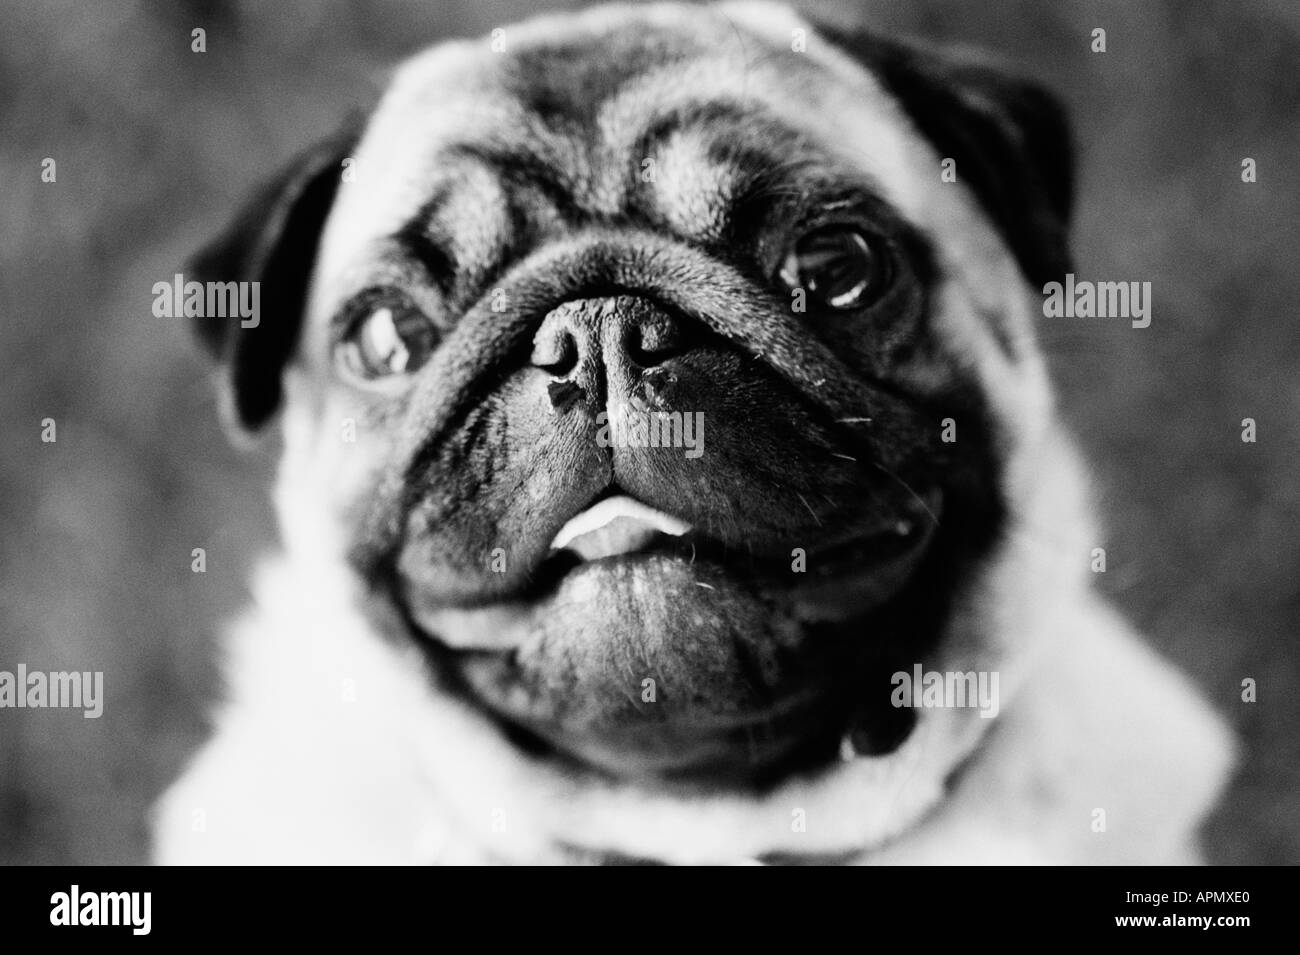 Portrait of a pug - Stock Image